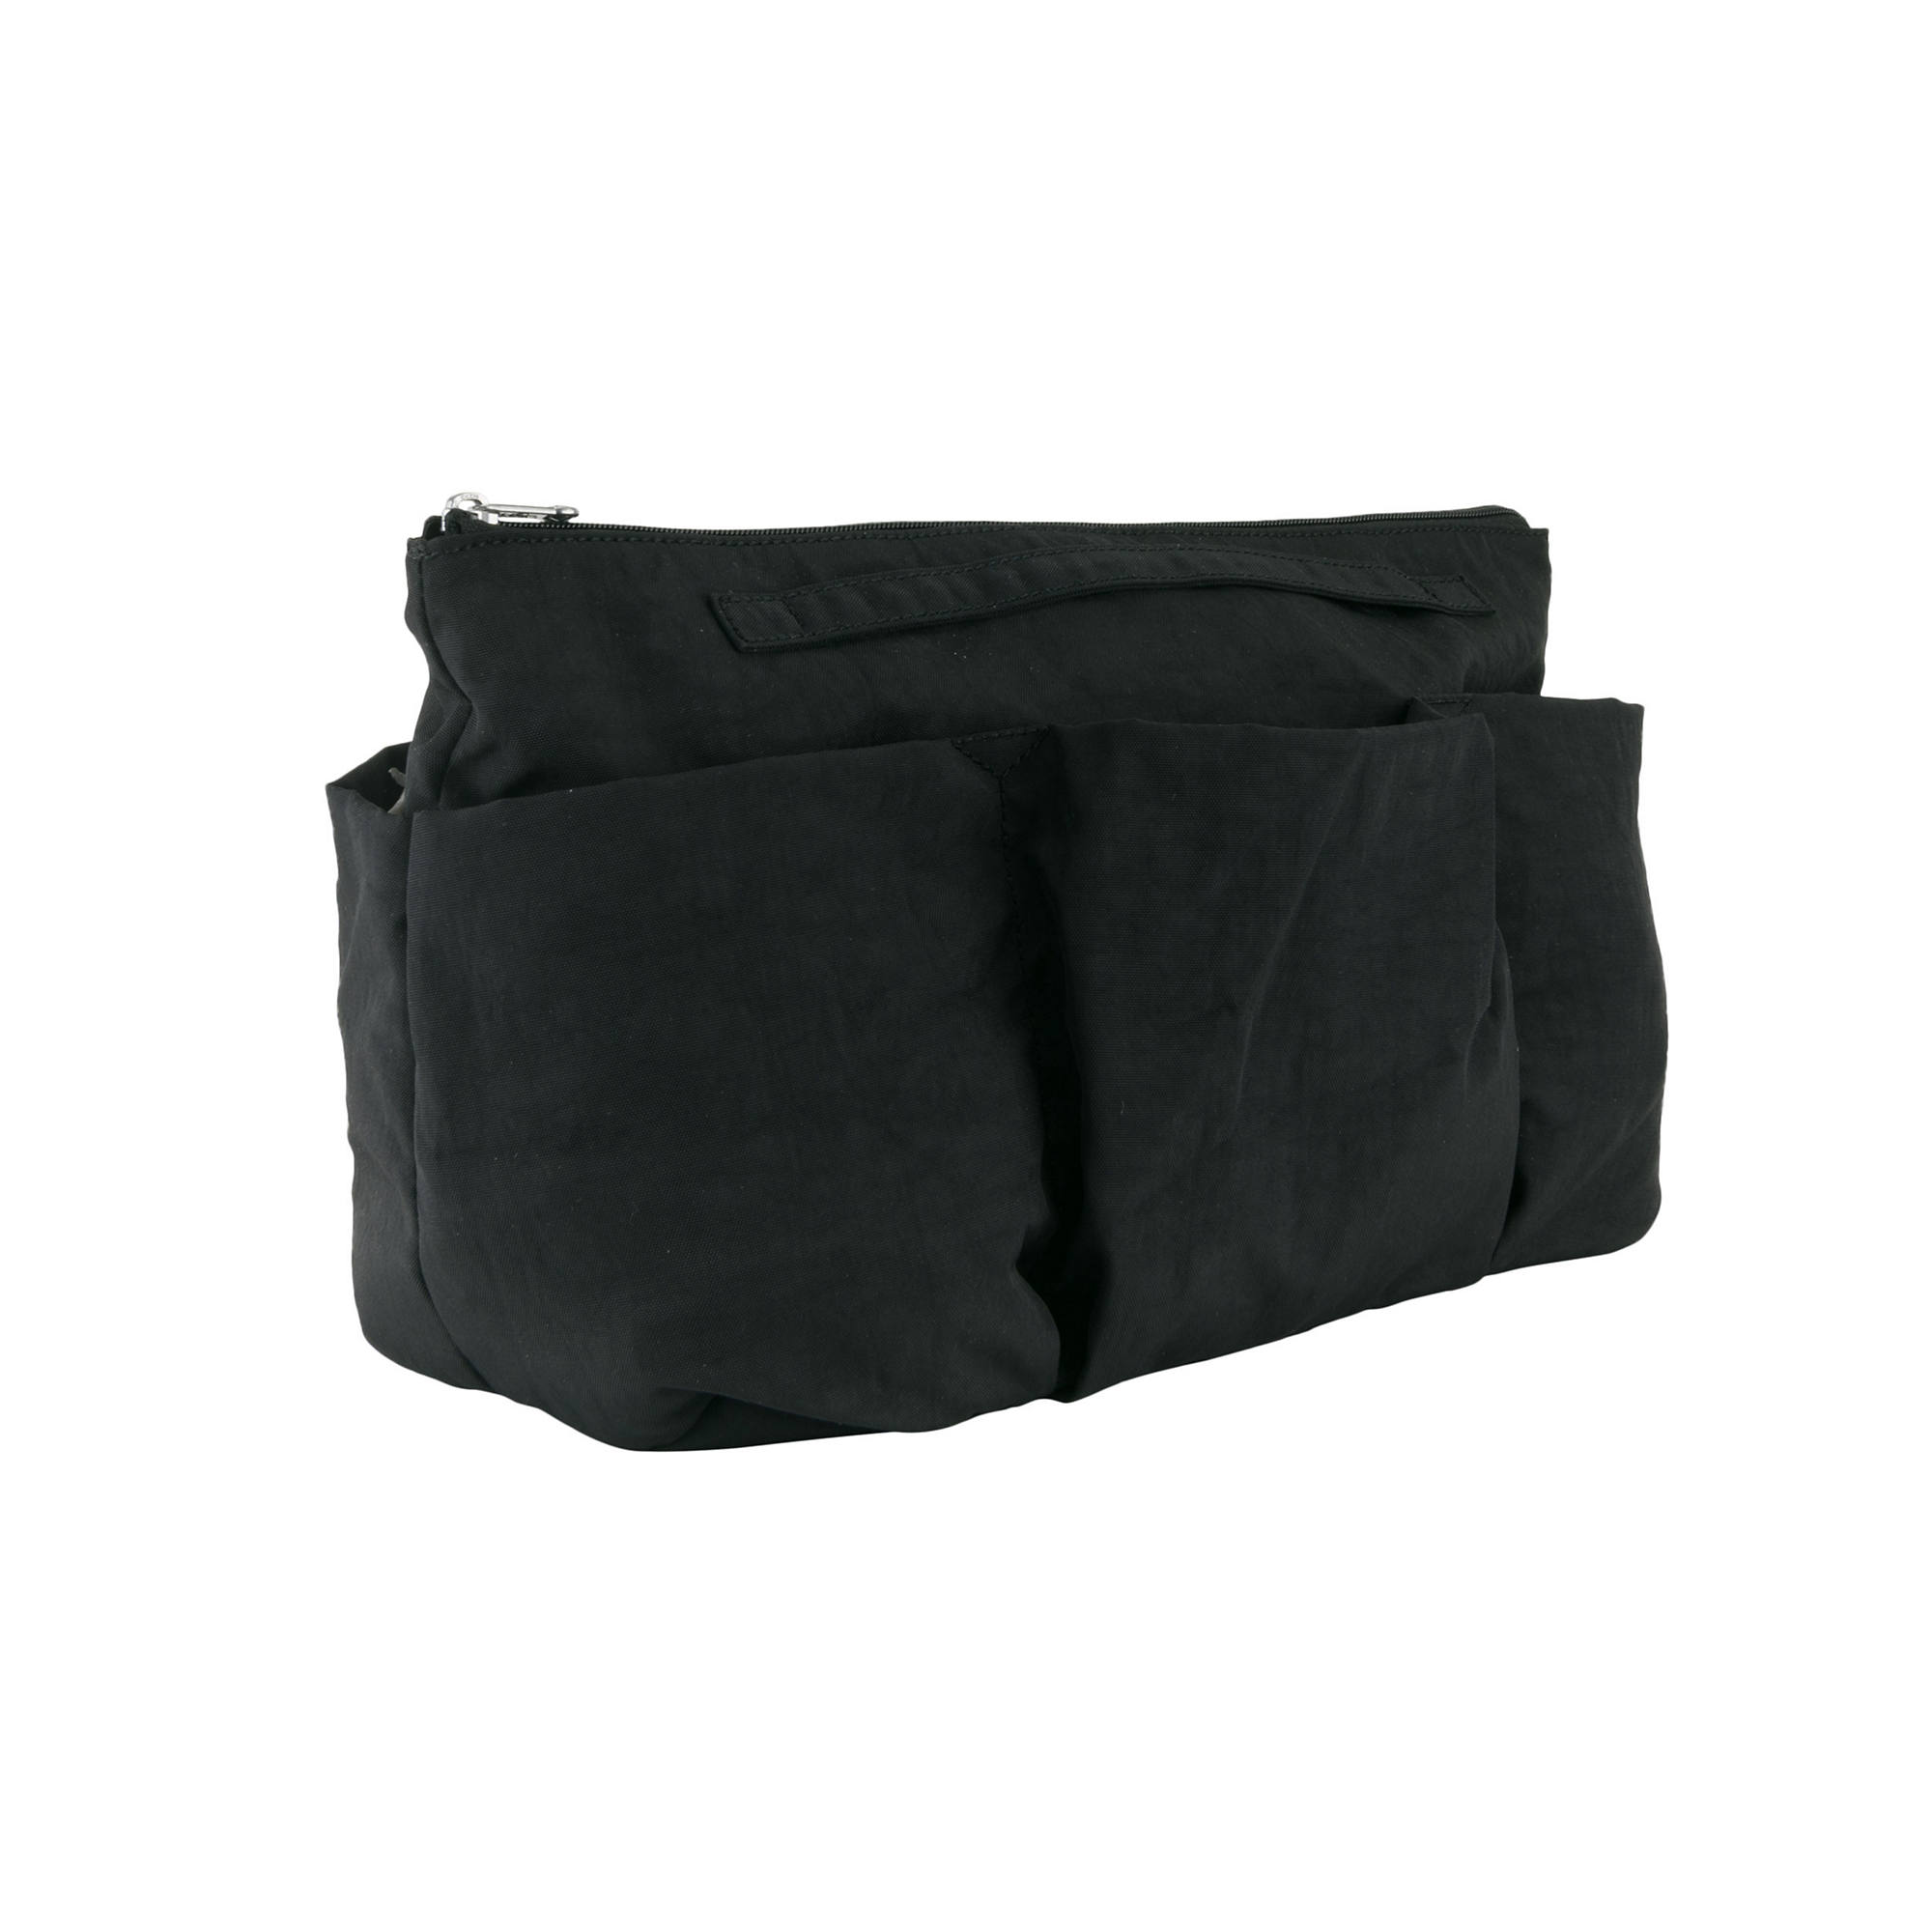 Beckett Handbag Organizer Kipling Travel Bag In 6 1 Korean An Organizerblacklarge